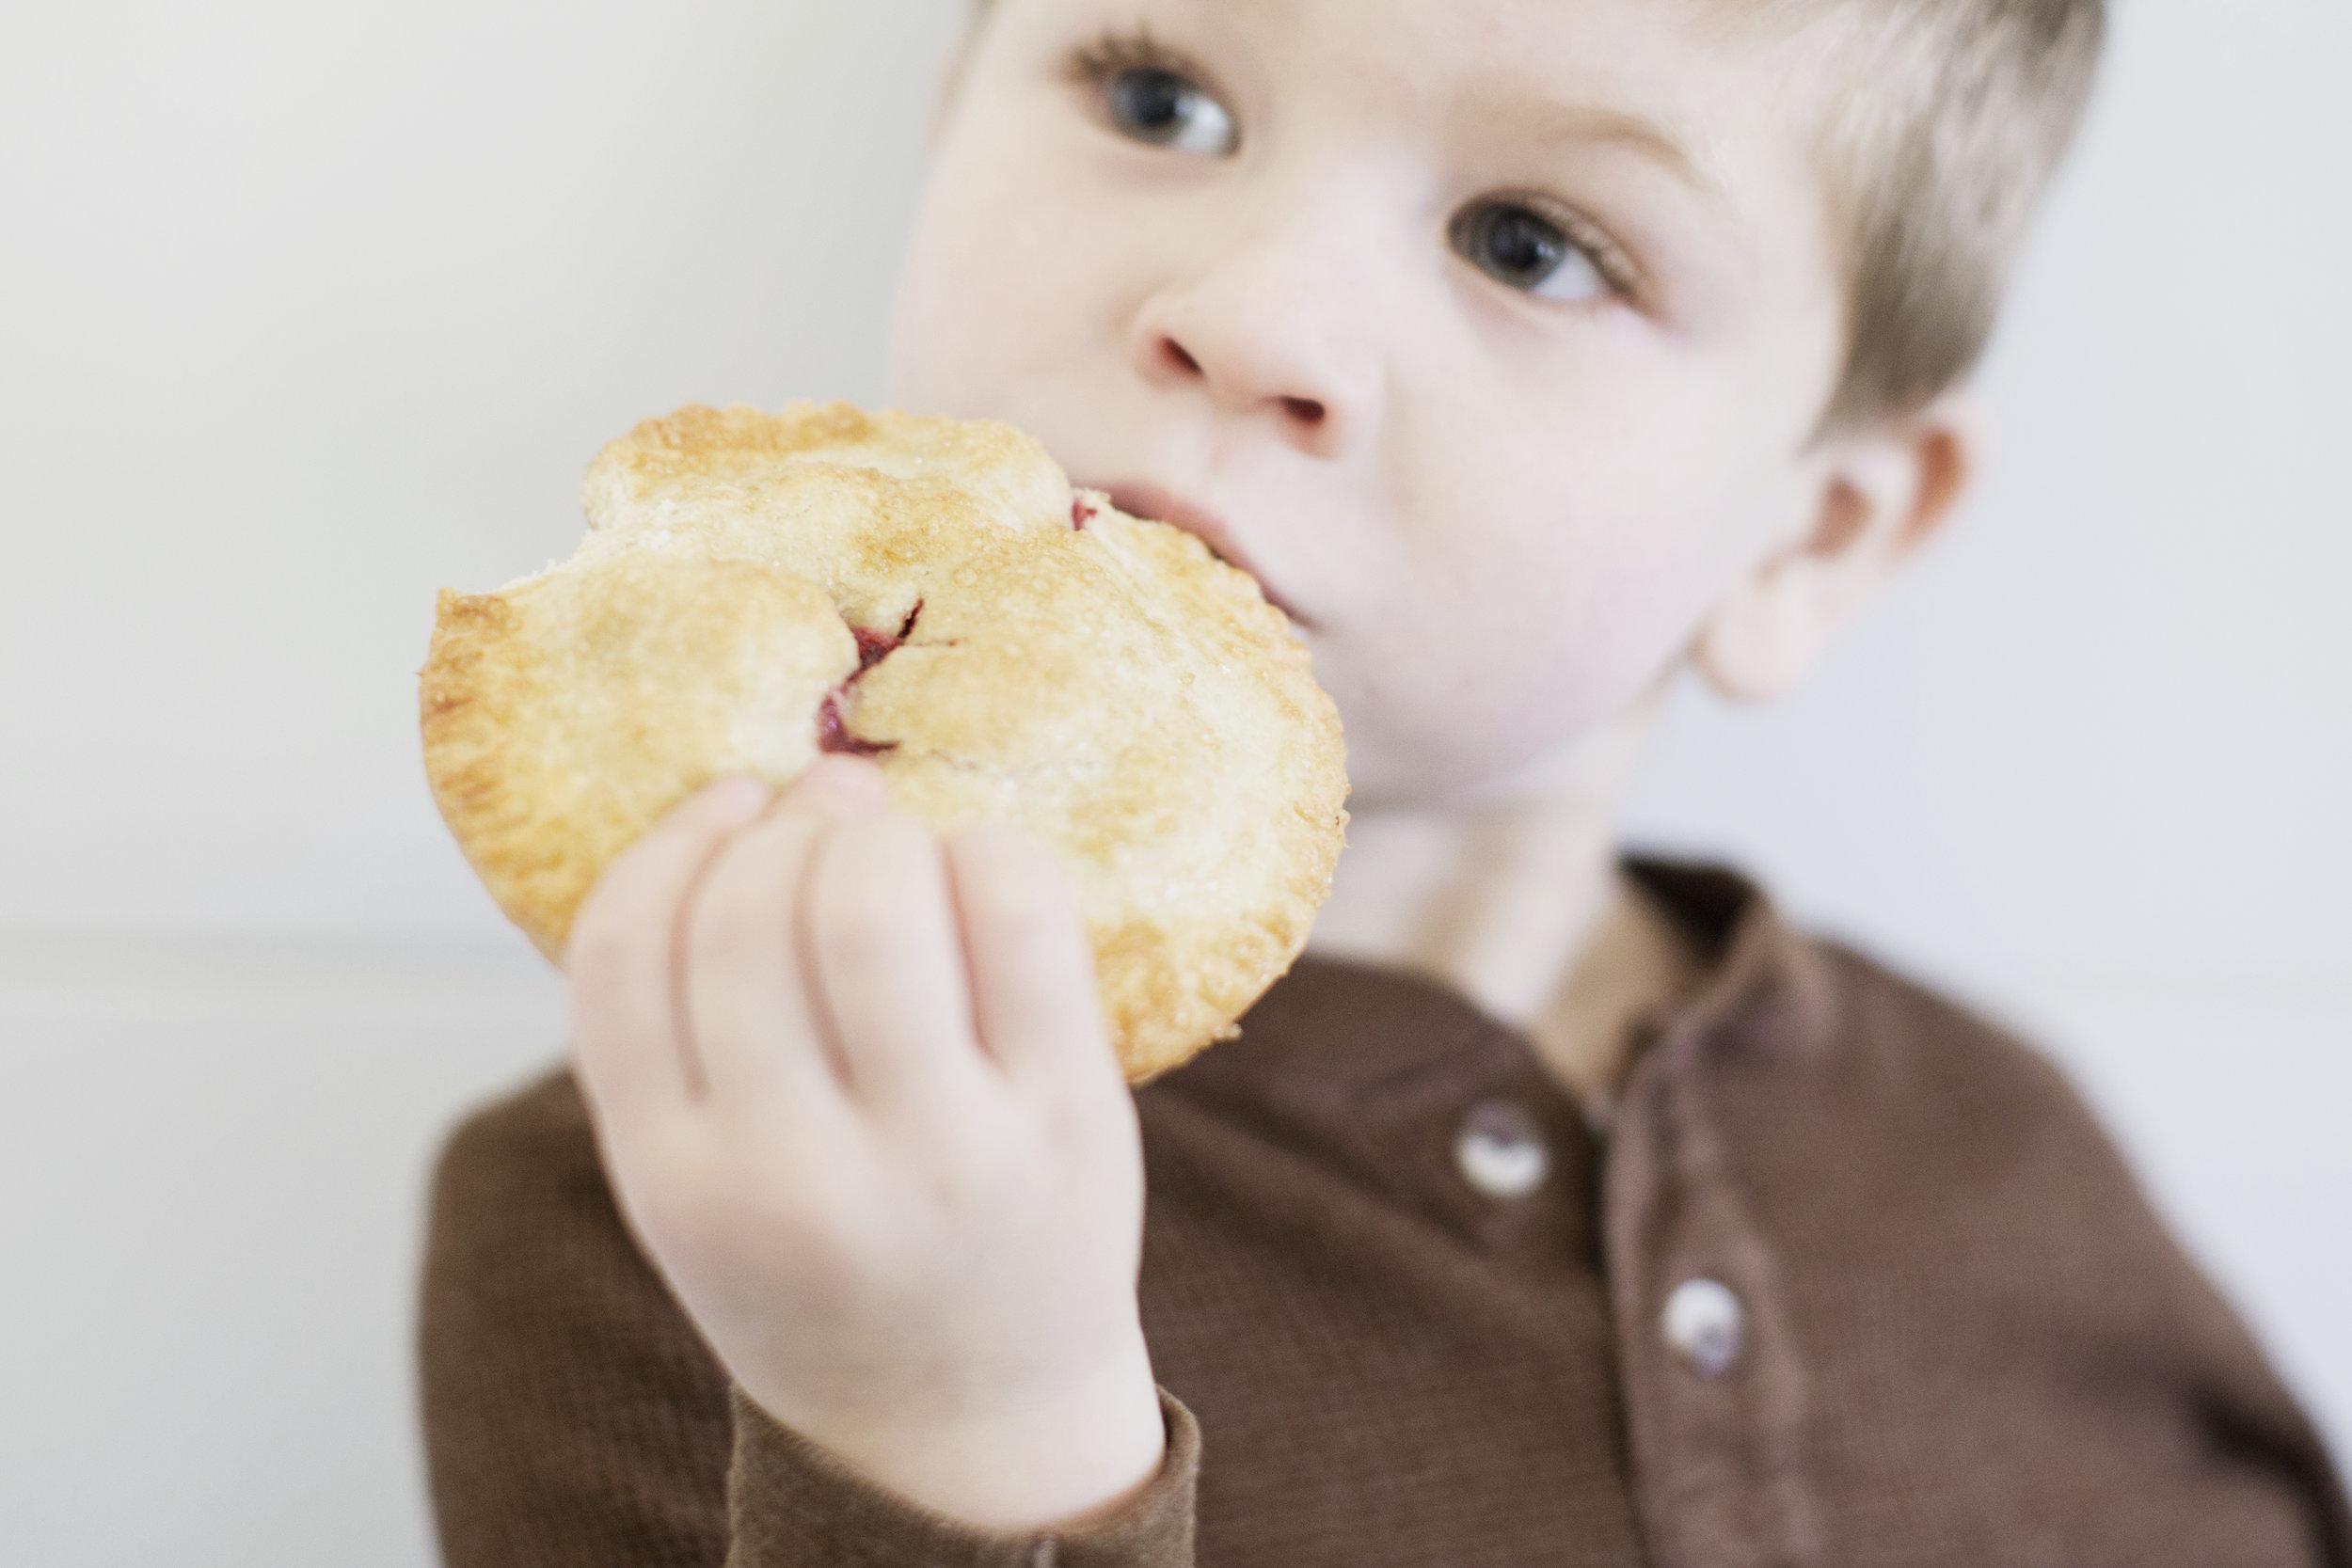 boy eating cranberry handpie Thanksgiving dessert